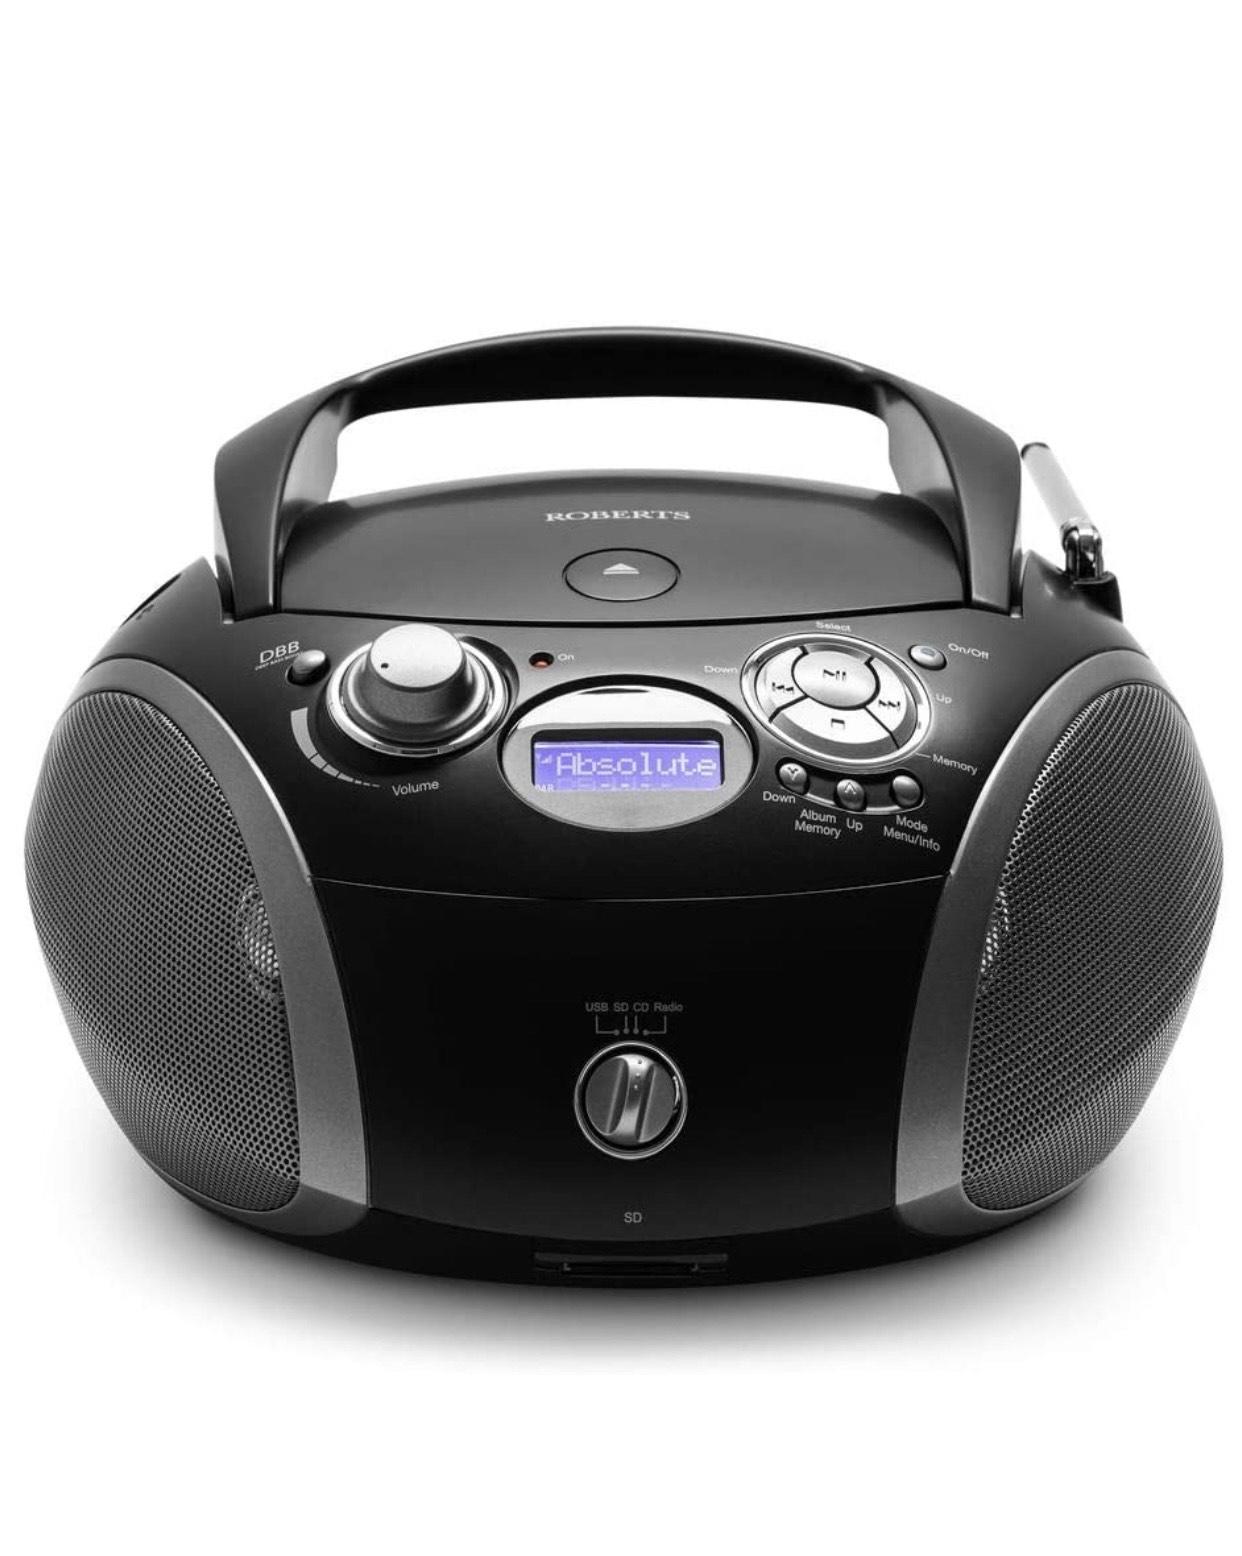 Roberts Radio ZoomBox 3 DAB/DAB+/FM/SD/USB Radio with CD Player £71.95 at Amazon